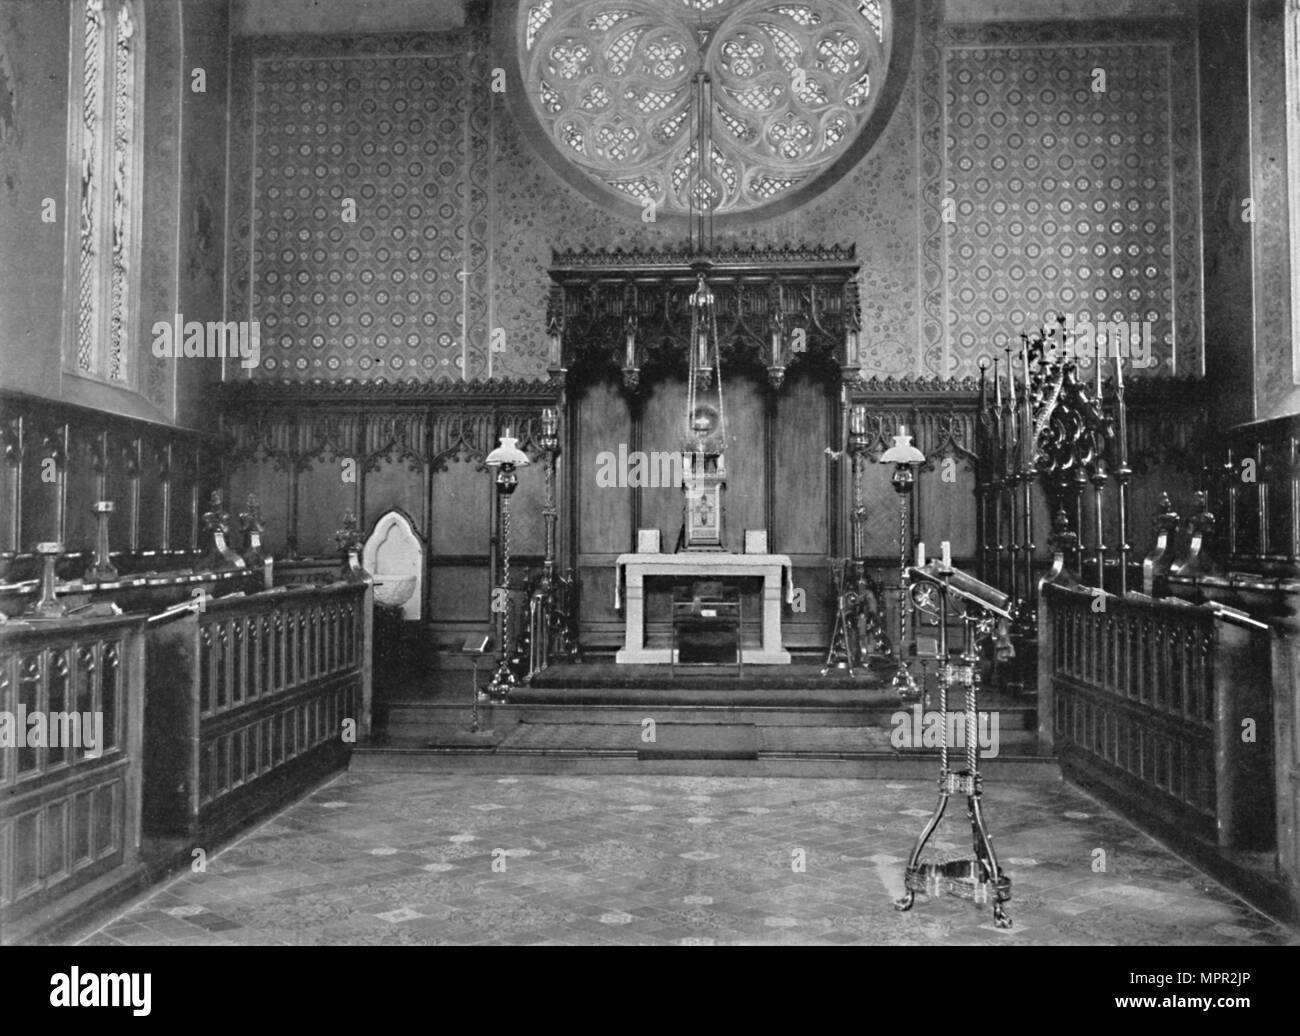 Catholic Apostolic Church Stock Photos & Catholic Apostolic Church